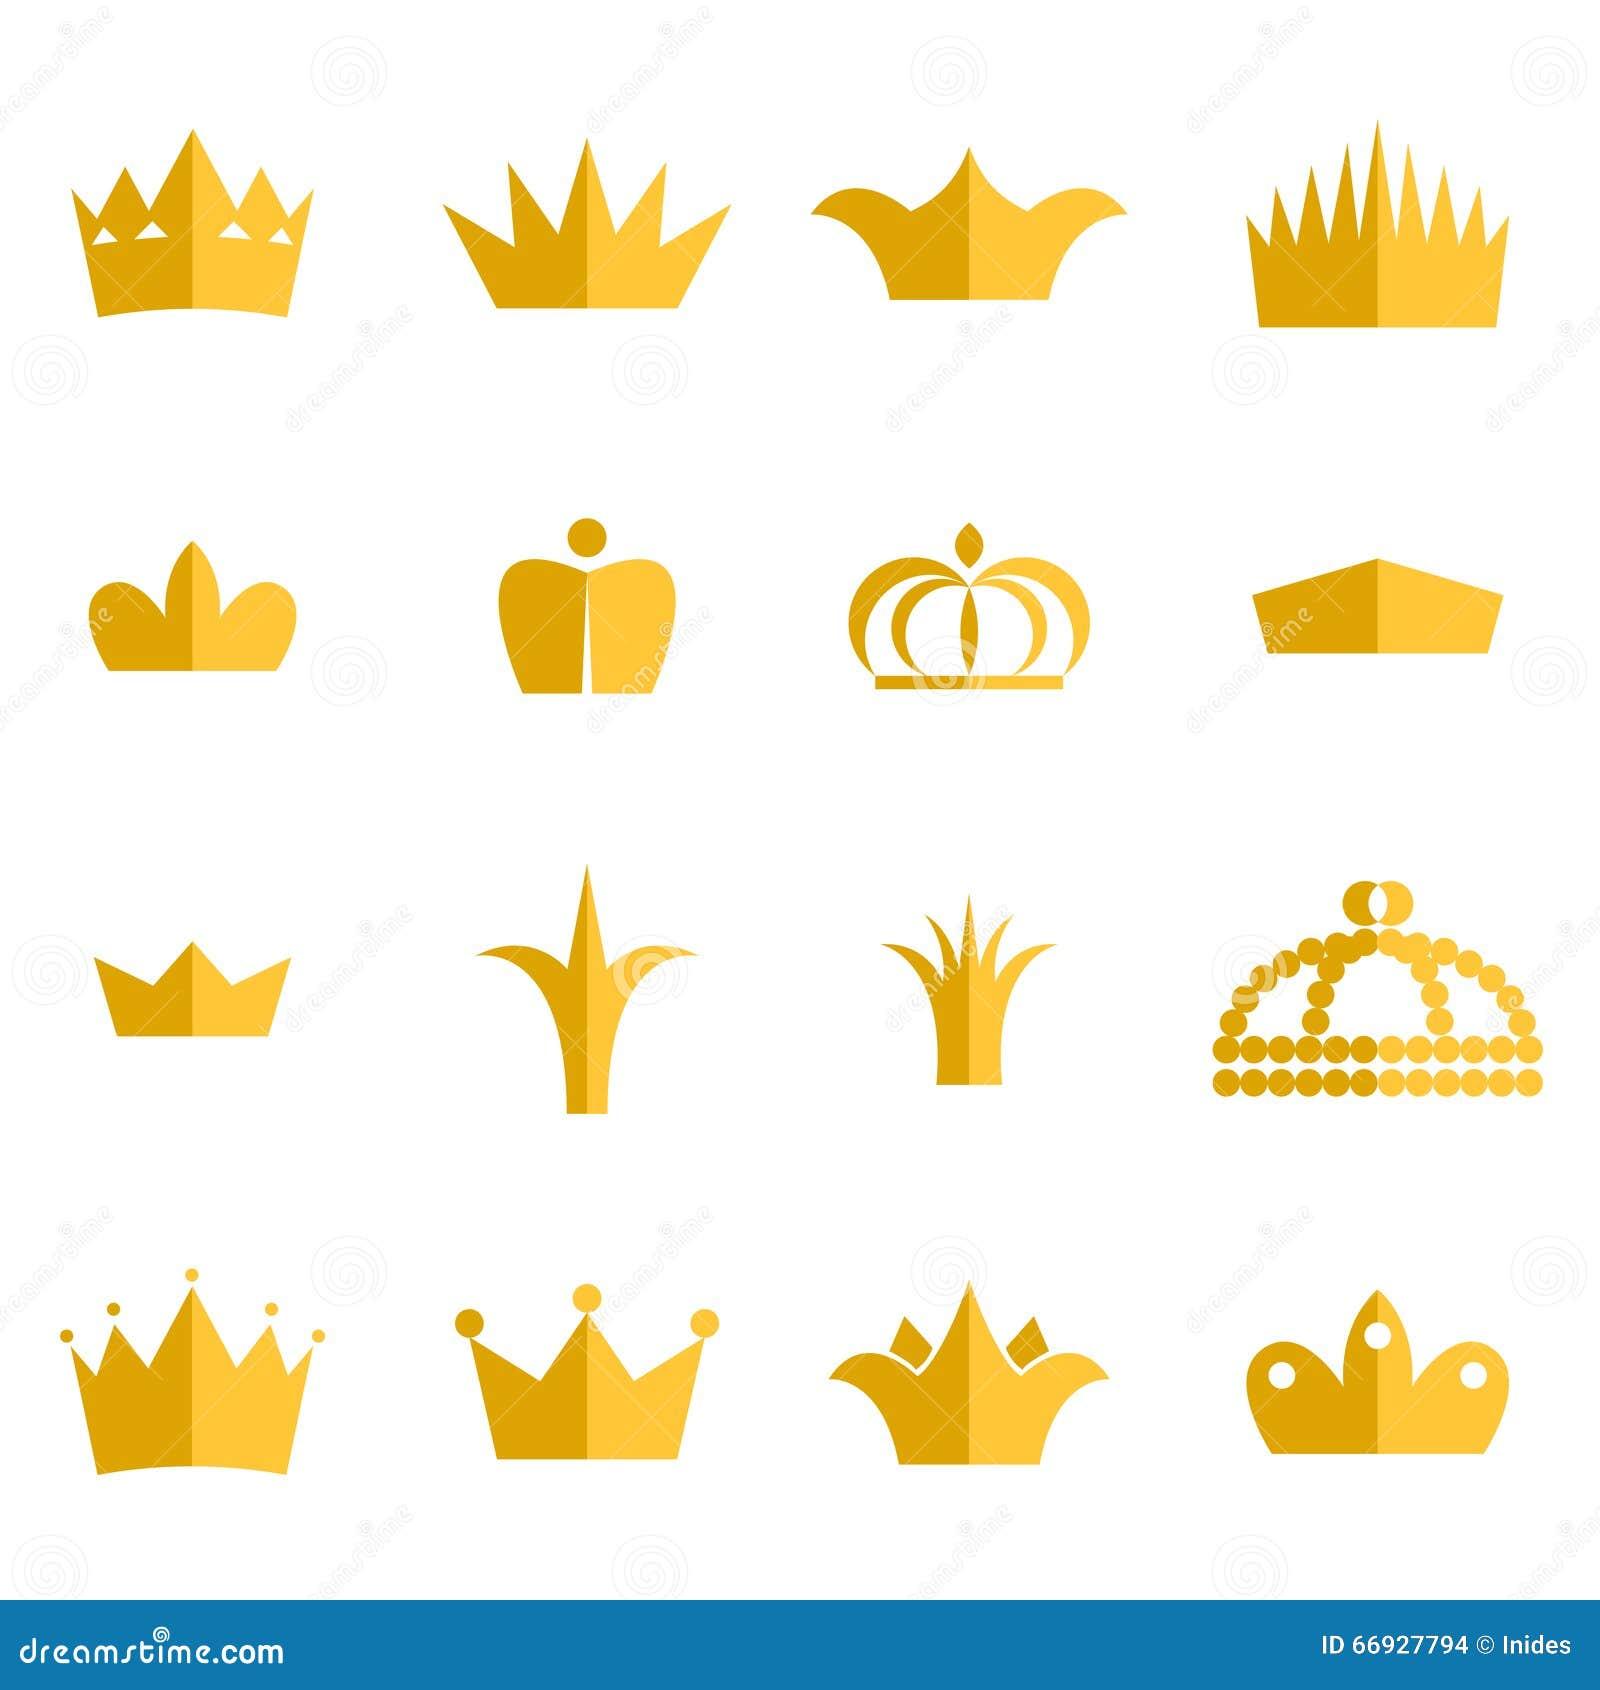 Gold crown clip art vector set.